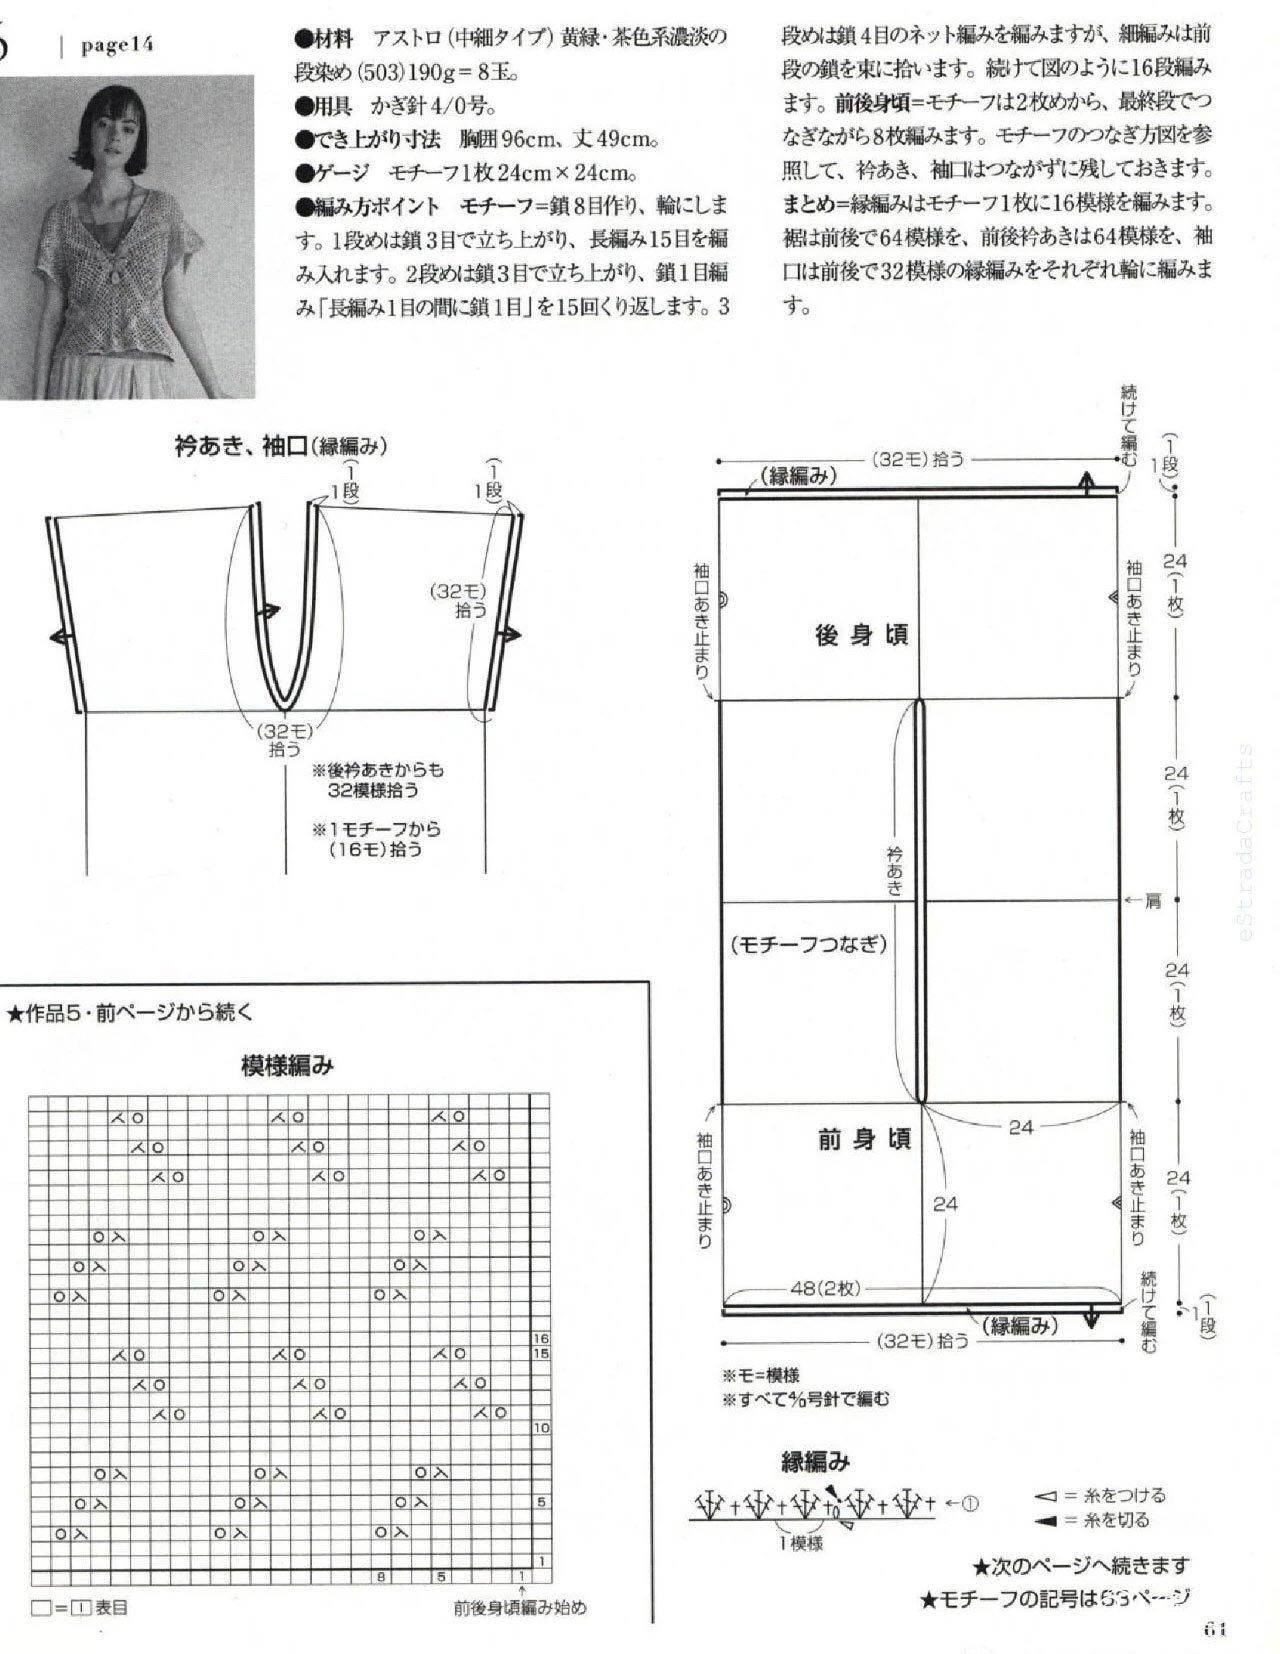 psb-(5).jpg